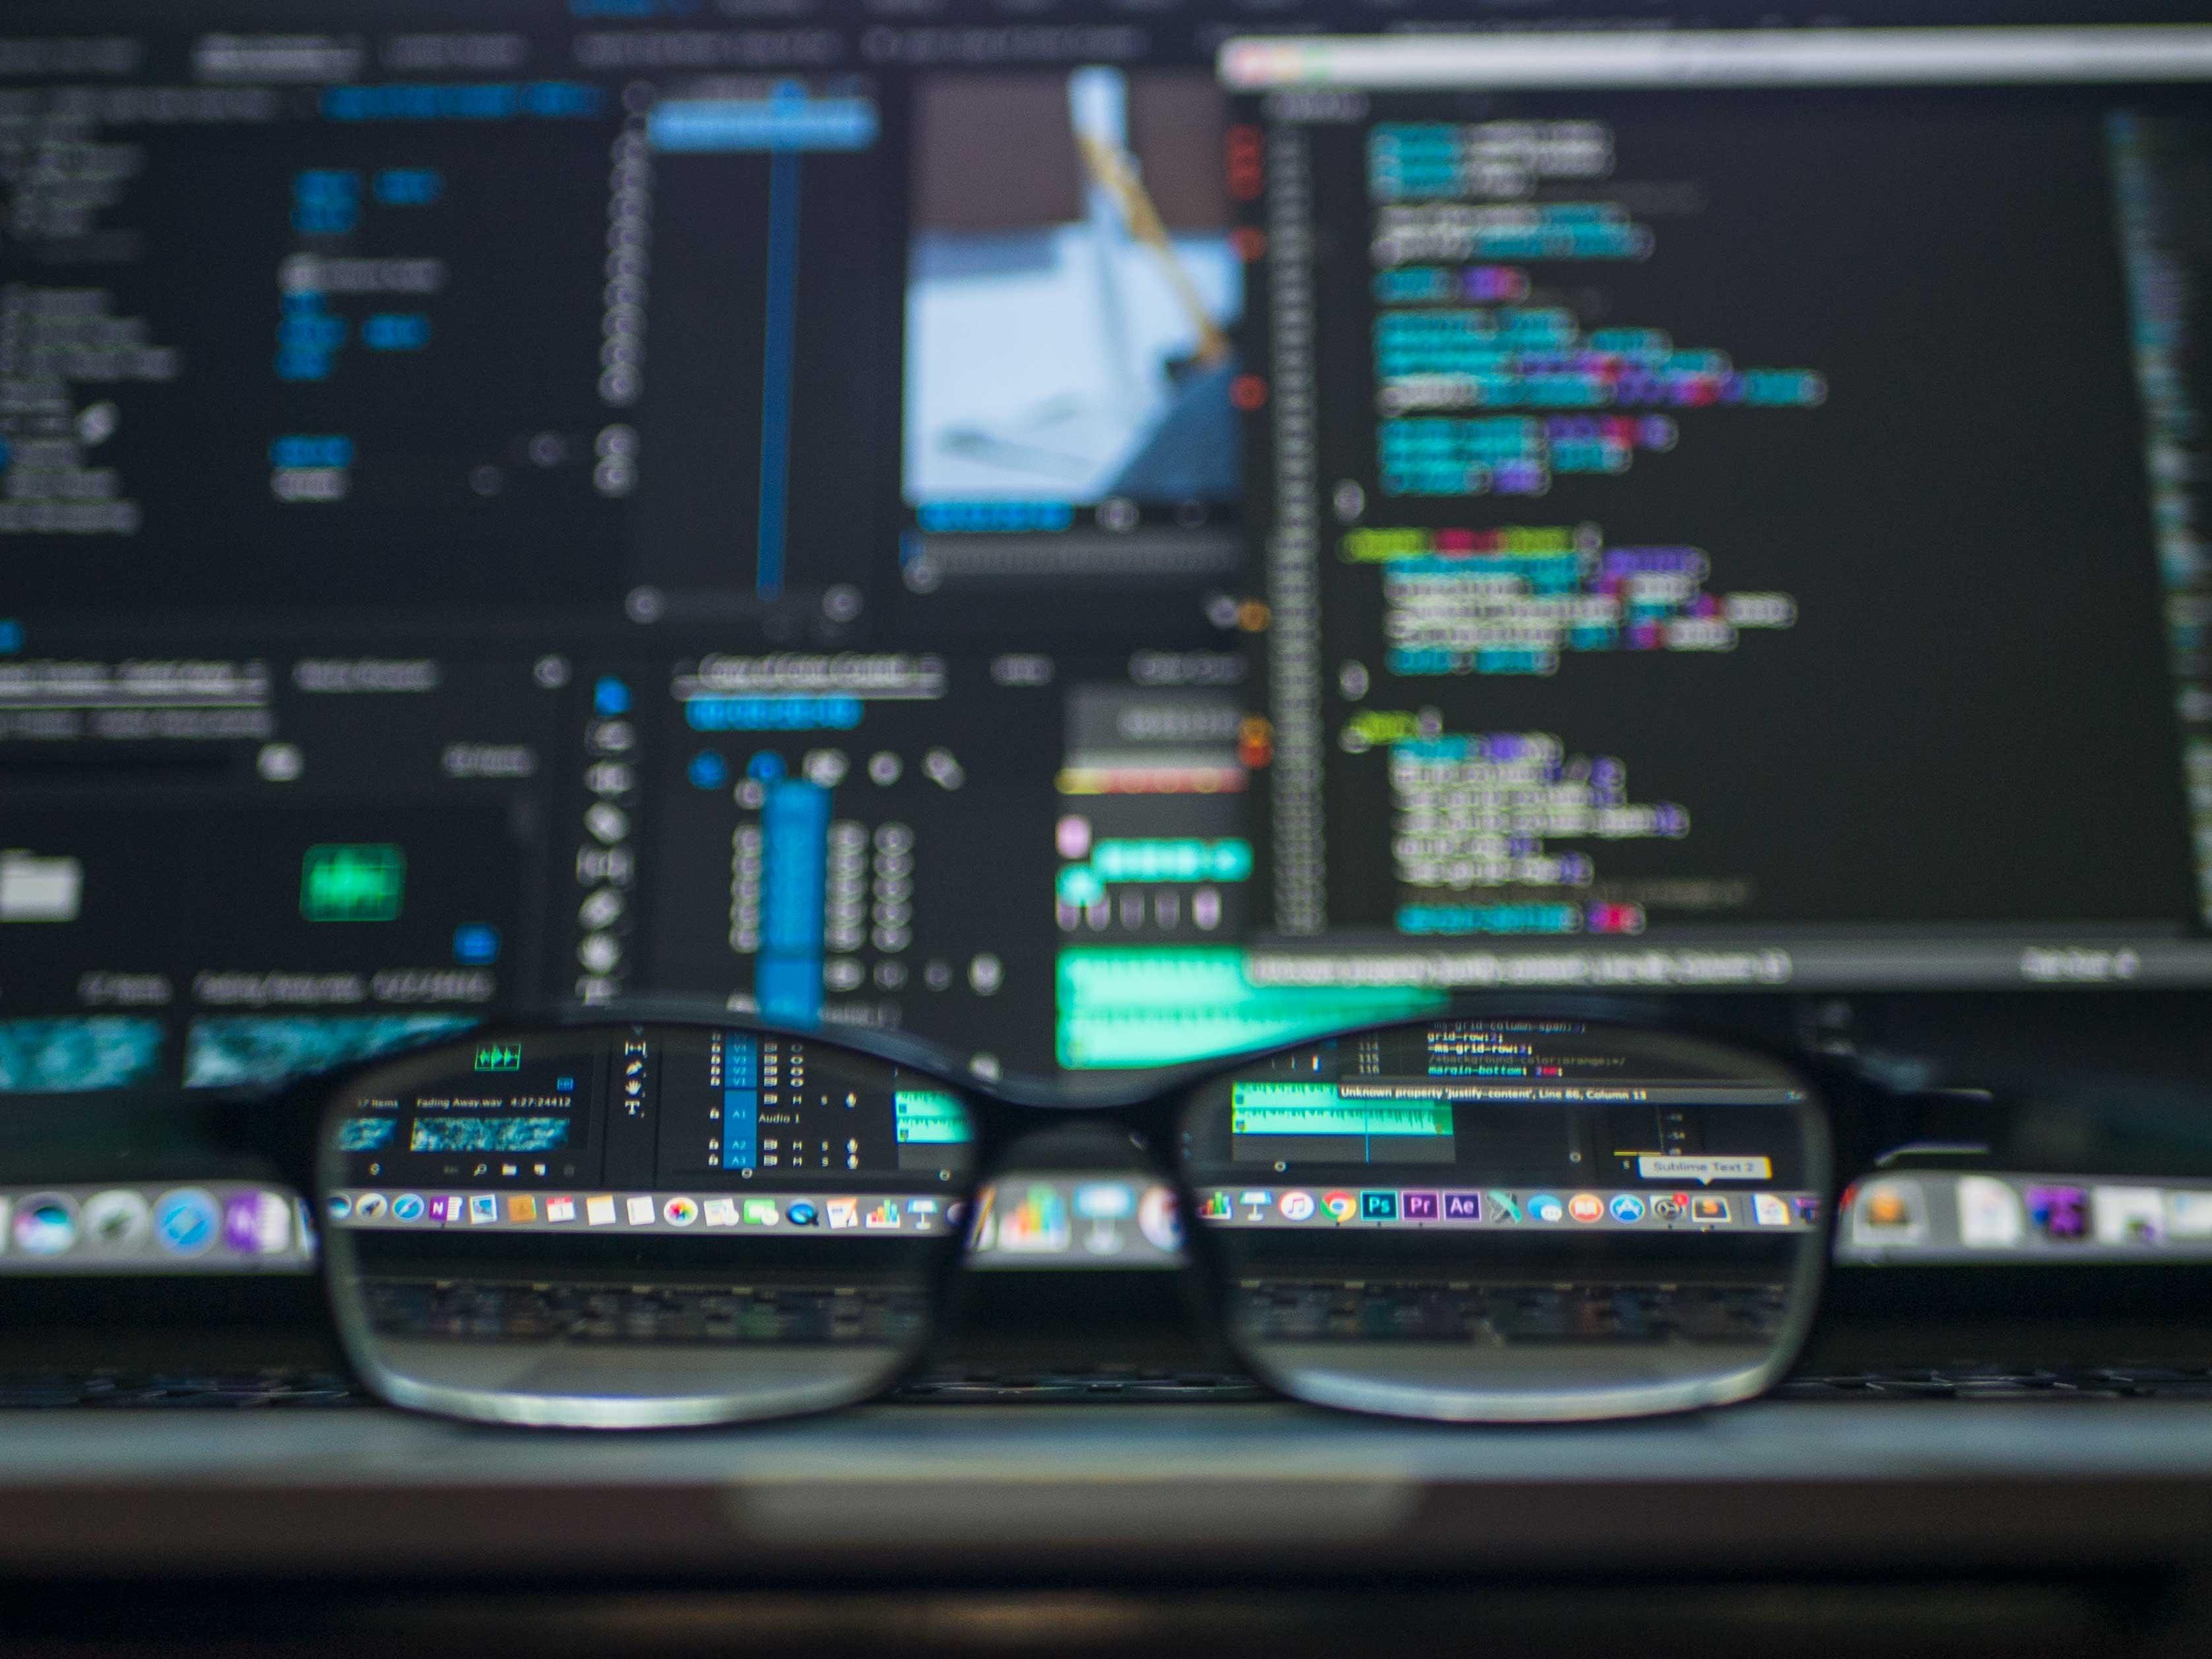 closeup photo of eyeglasses